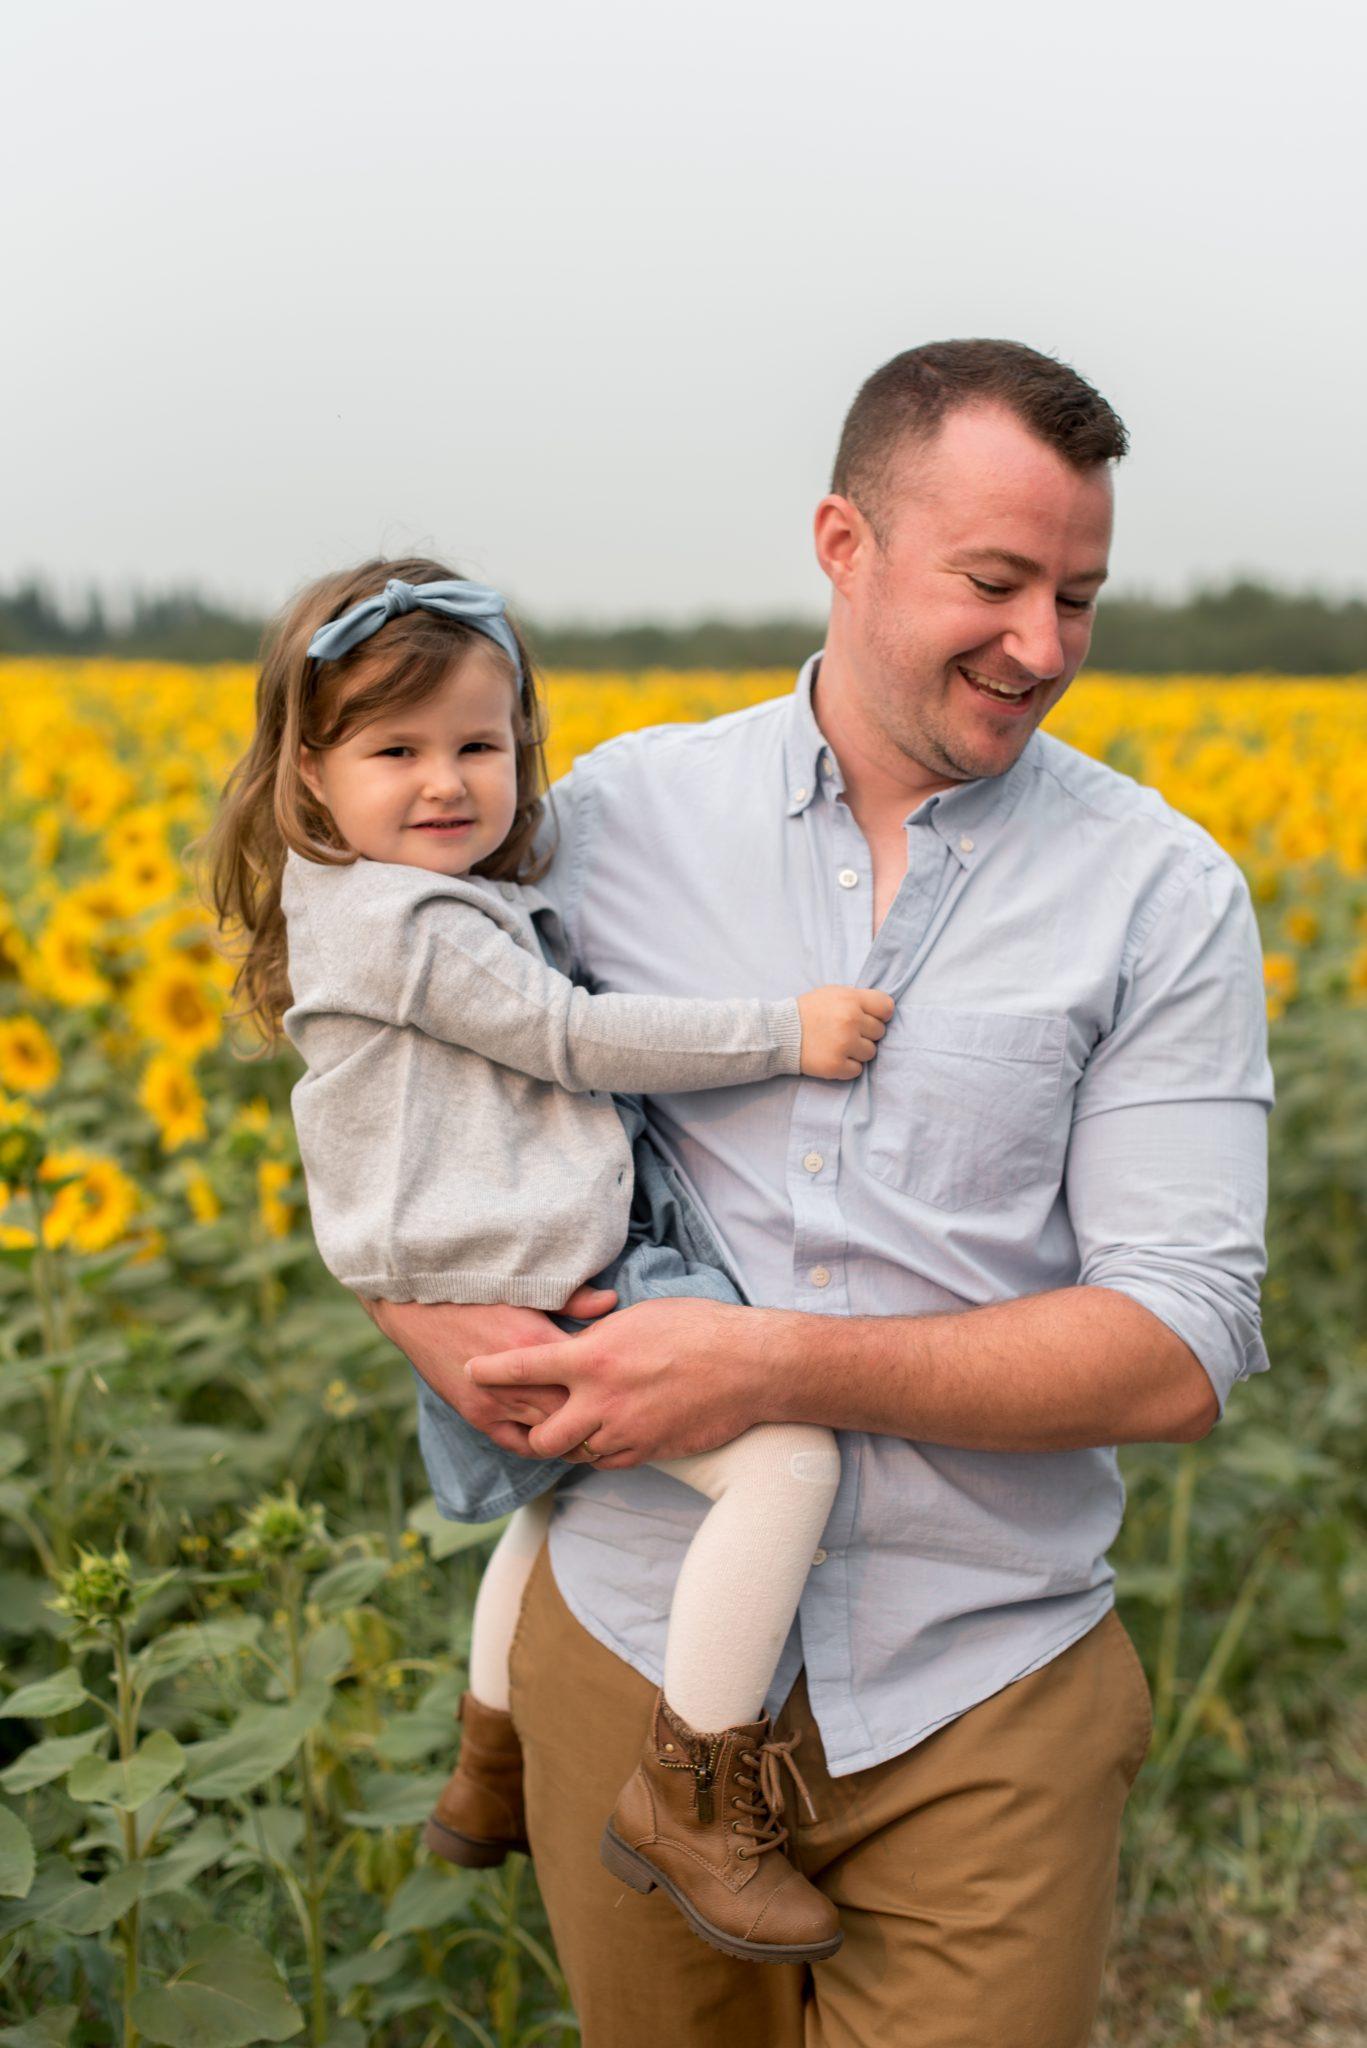 Edmonton Family Photos in a Sunflower Field